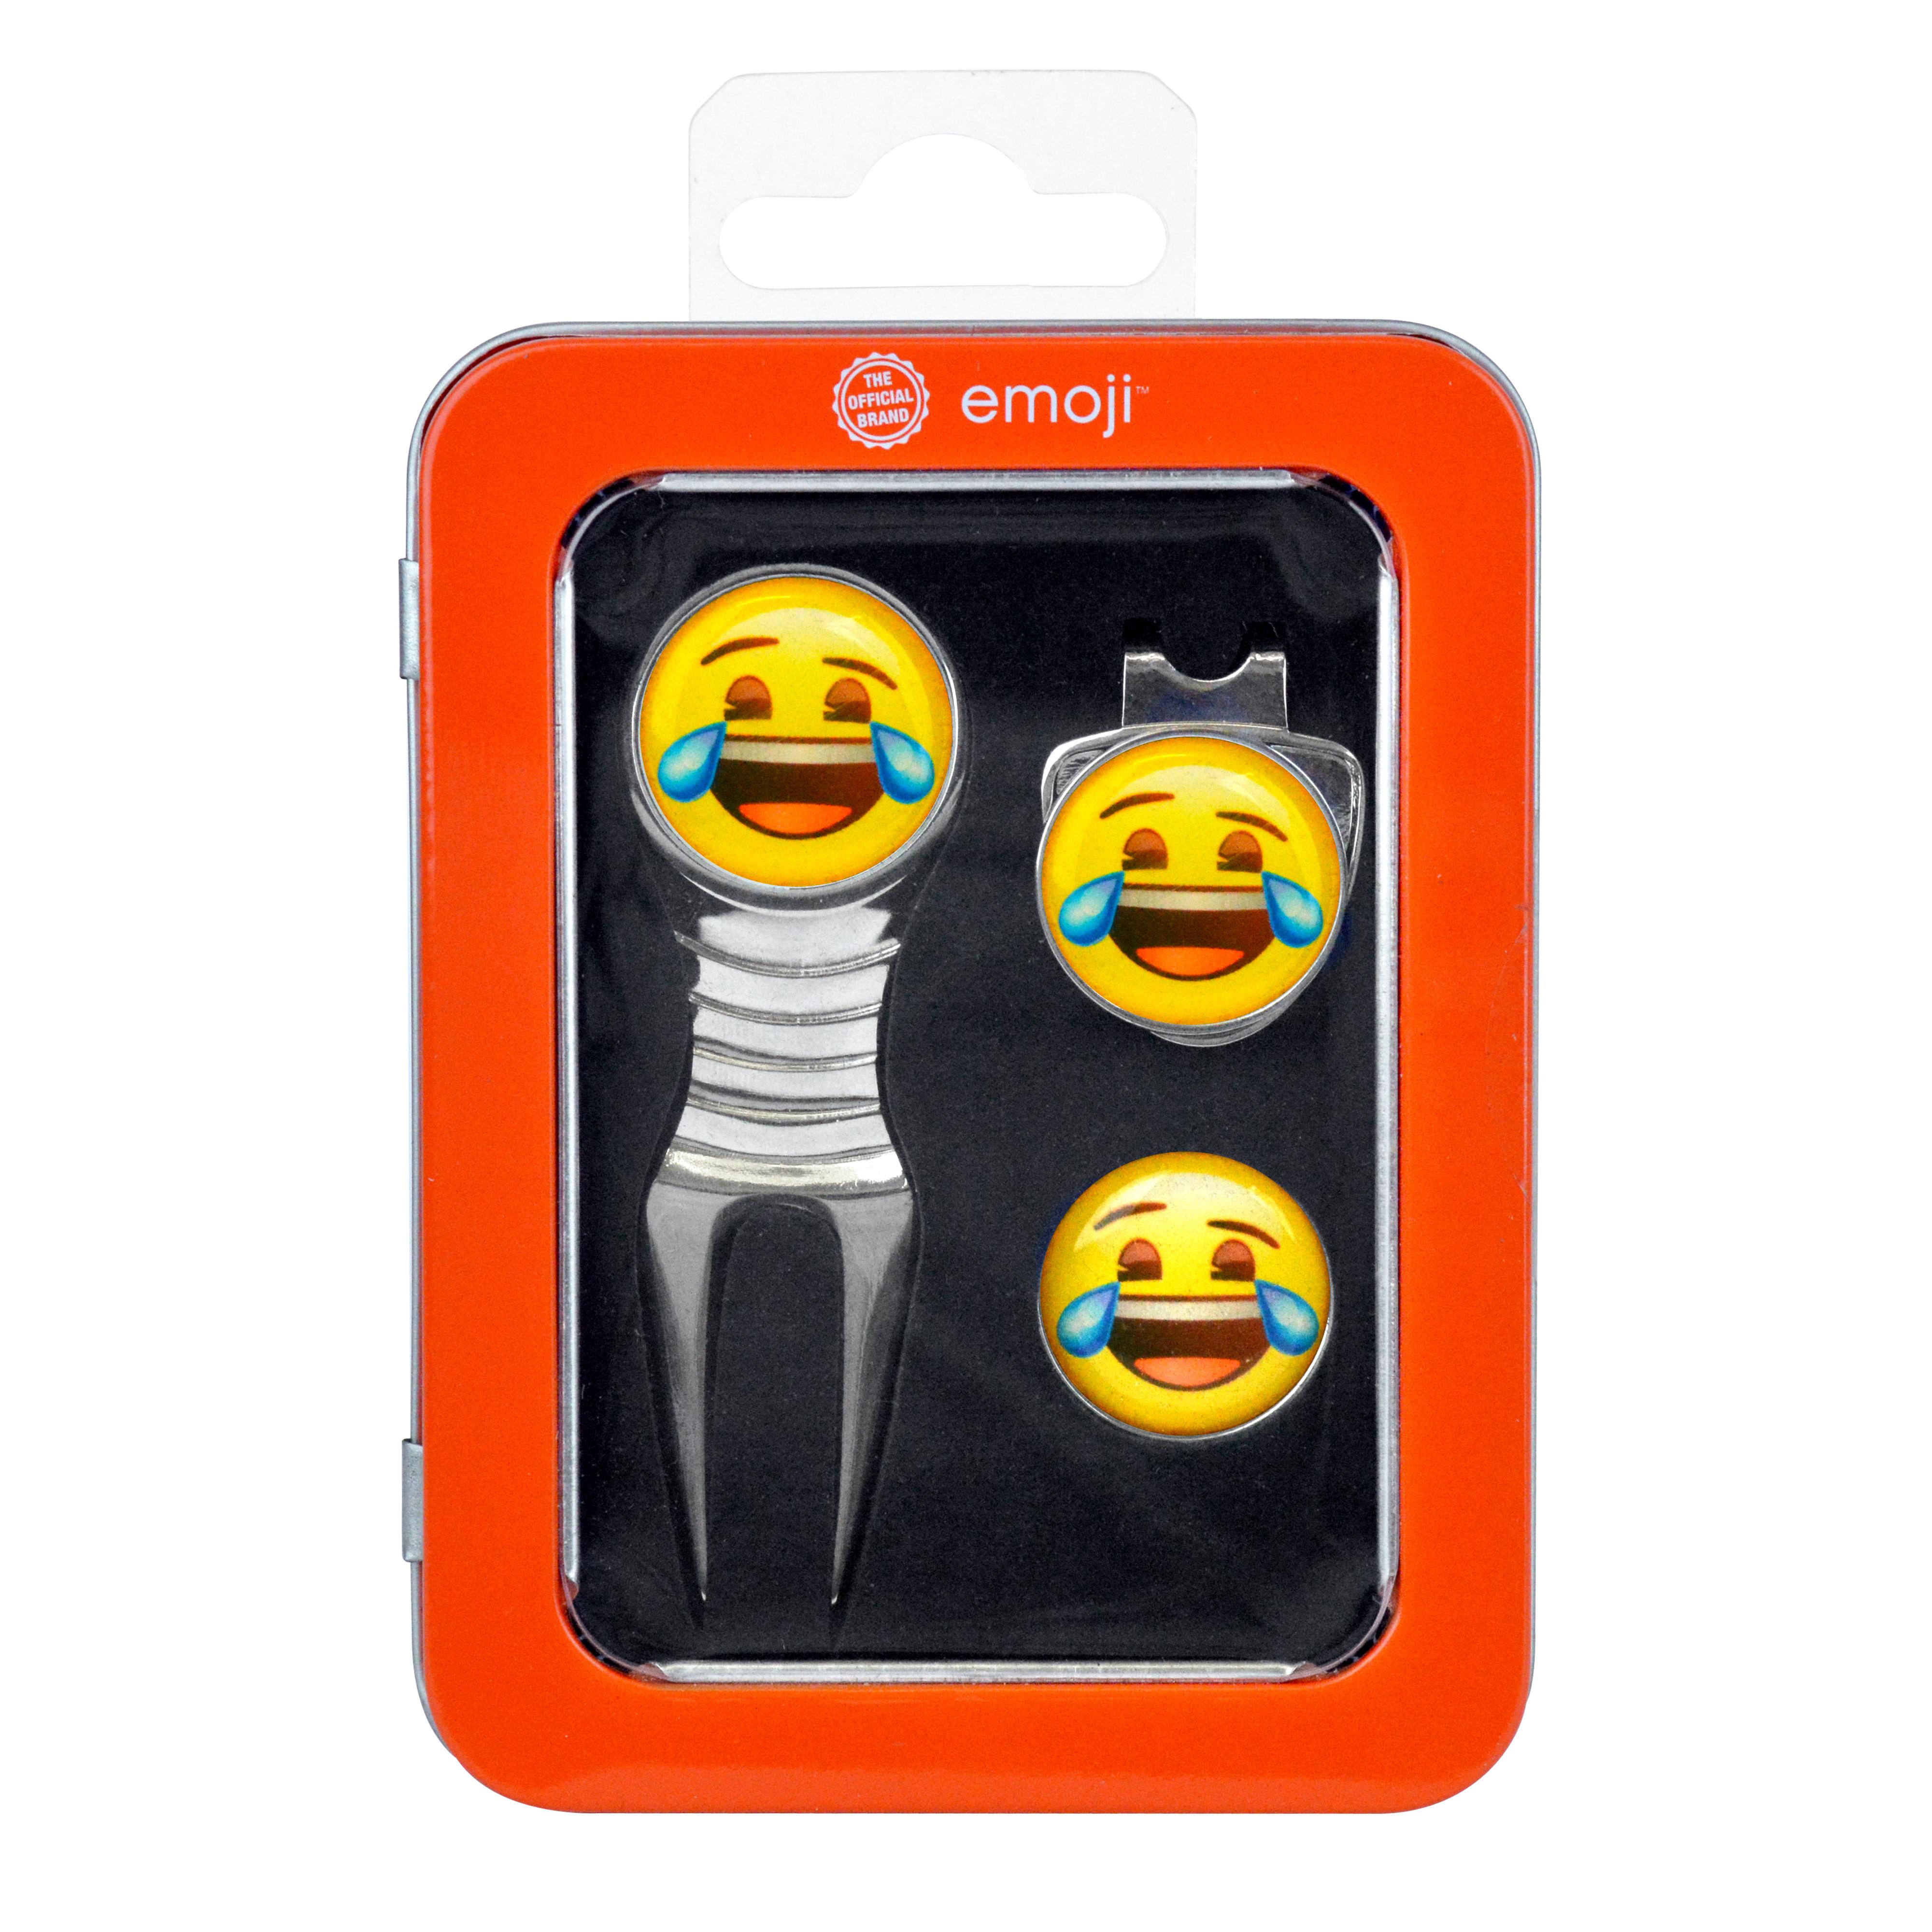 Emoji Divot Tool Giftset Laugh